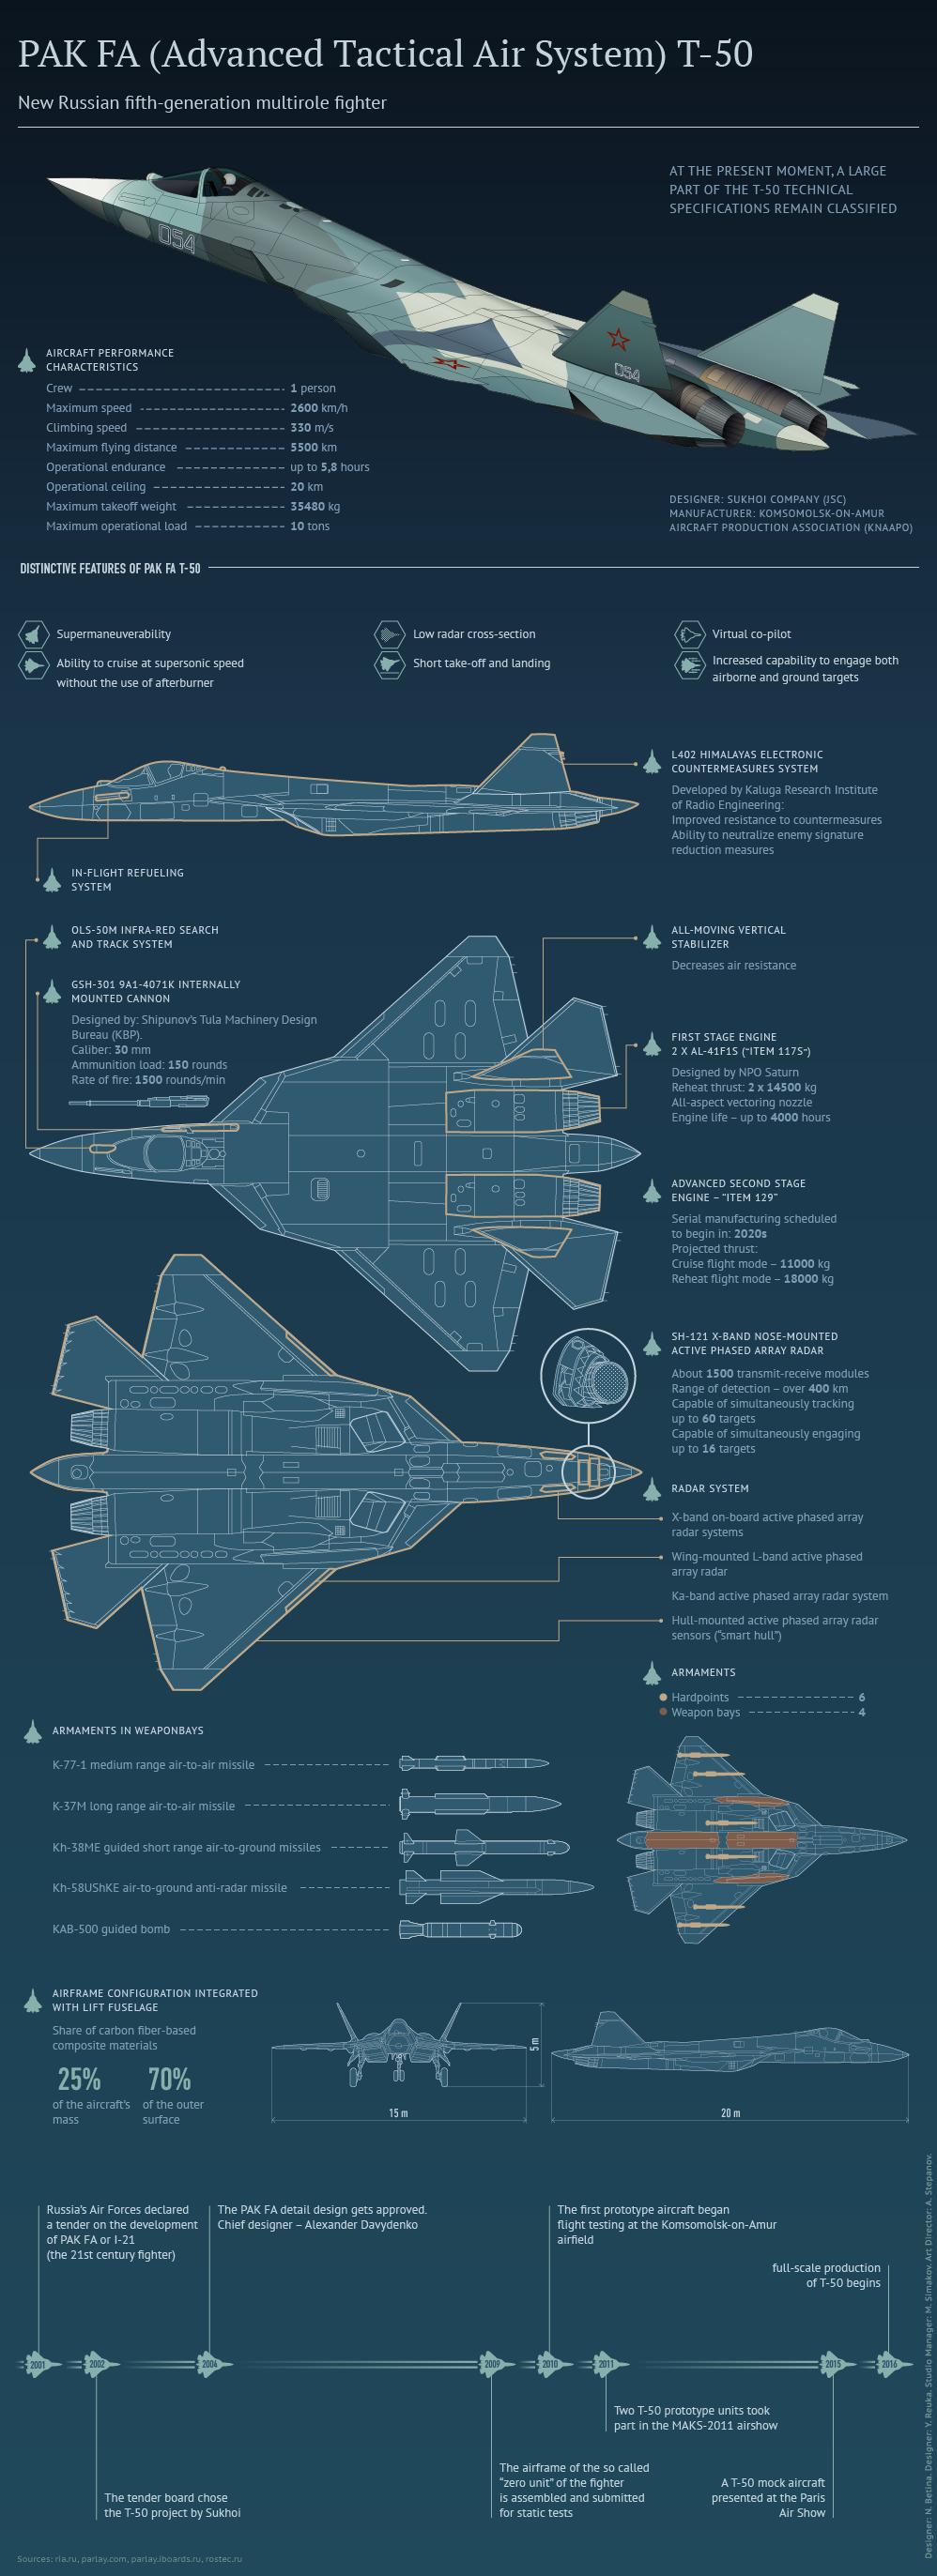 PAK FA (Advanced Tactical Air Sistem) T-50